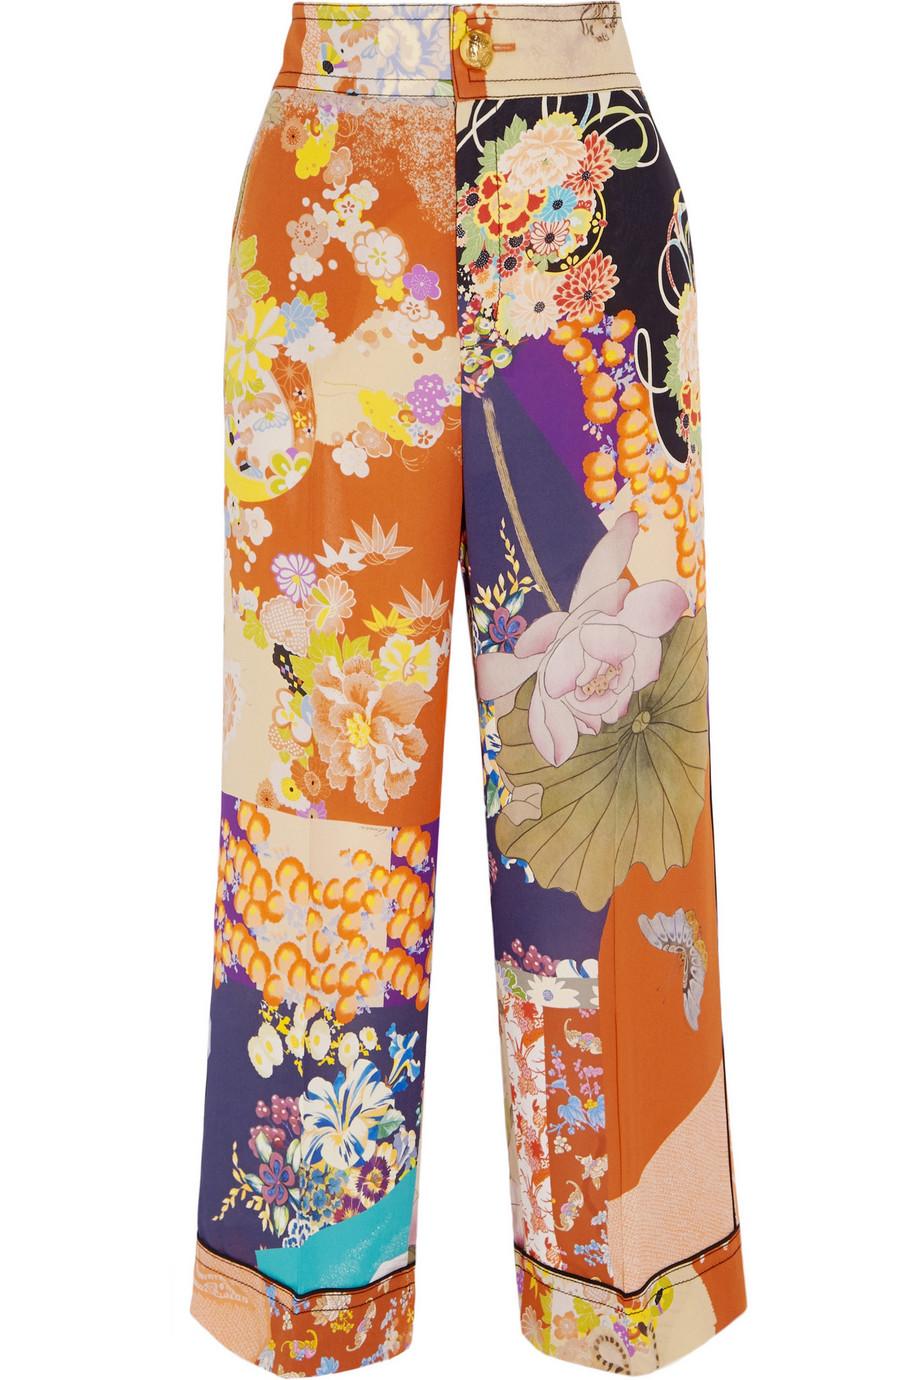 Gucci Cropped Printed Silk Crepe De Chine Wide-Leg Pants, Size: 40